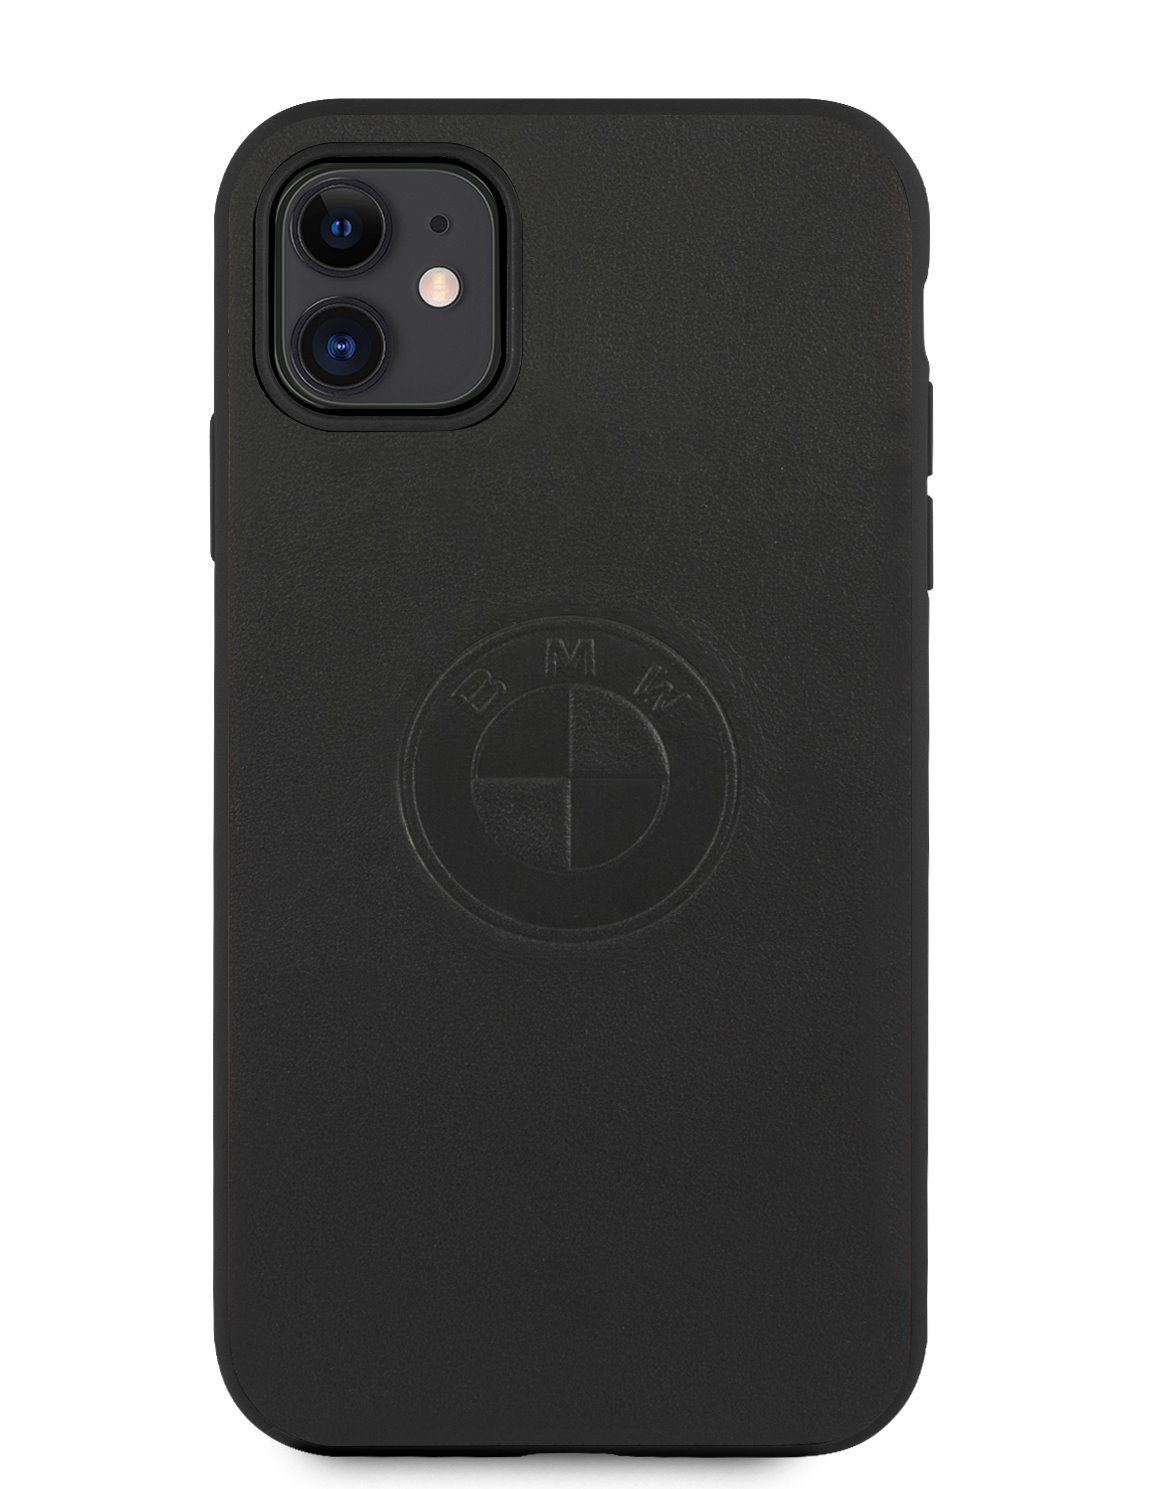 Ochranný kryt BMW Signature Leather Embossed Logo BMHCP12LREELK pro Apple iPhone 12 Pro Max, černá